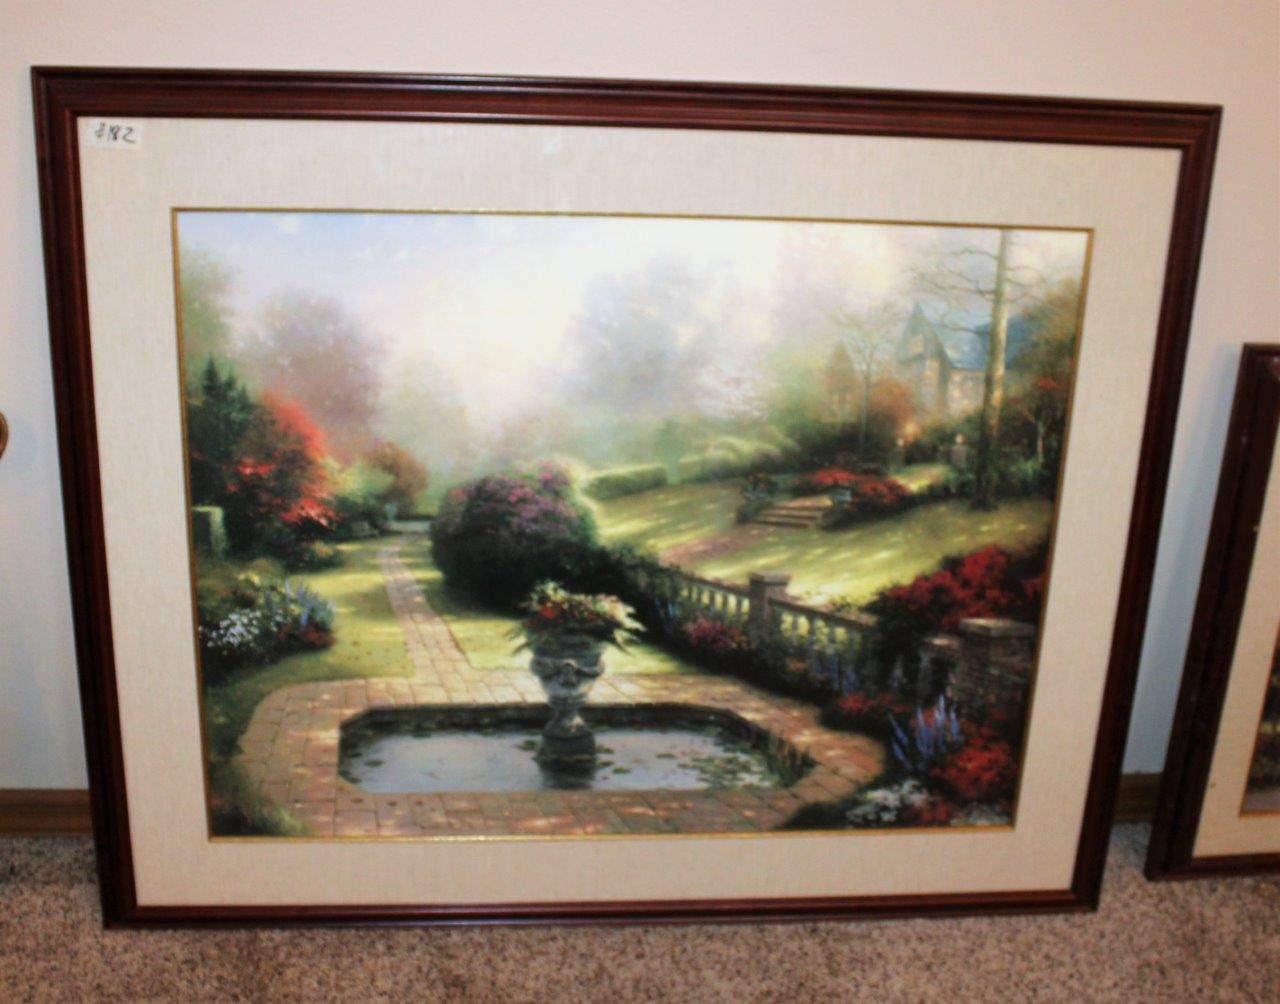 "Lot#182 Landscape Print Wall Art 43"" x 35""h  (main image)"